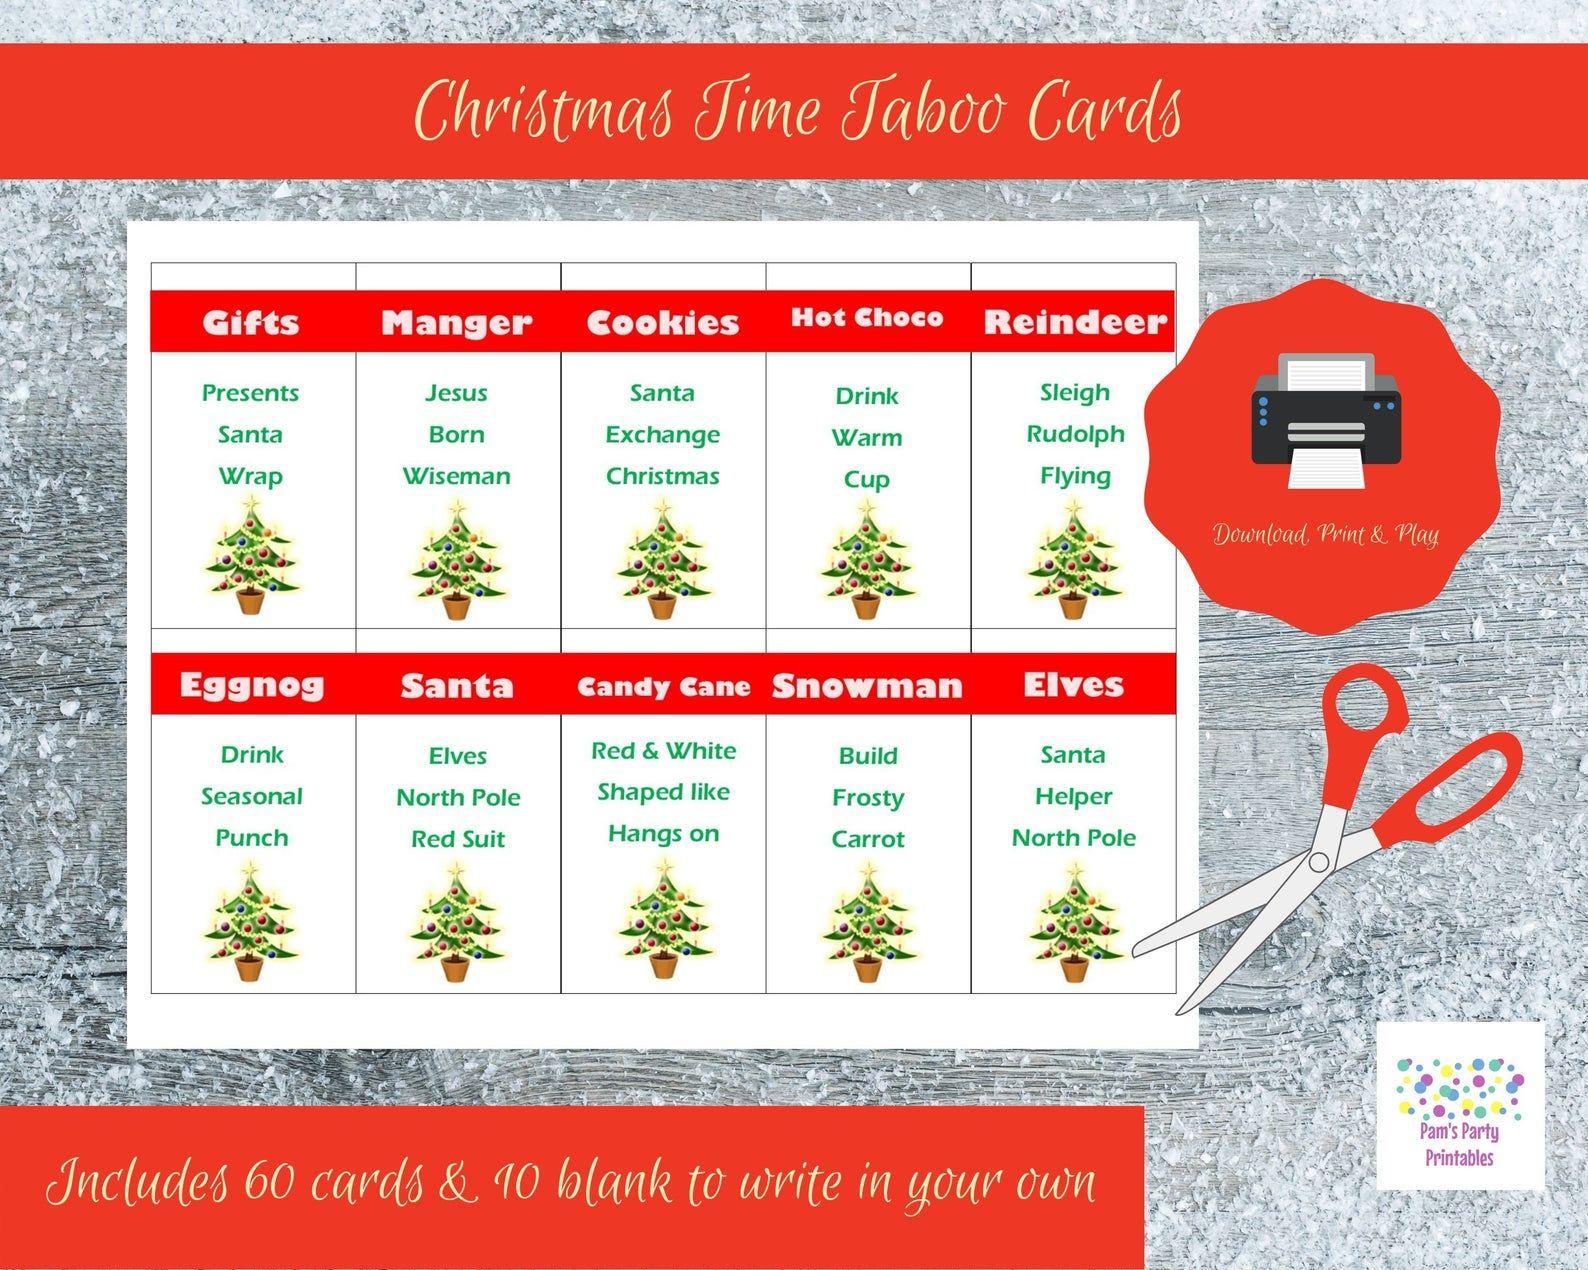 Printable Christmas Game Cards For Taboo Group Game Family Etsy Printable Christmas Games Taboo Game Card Games